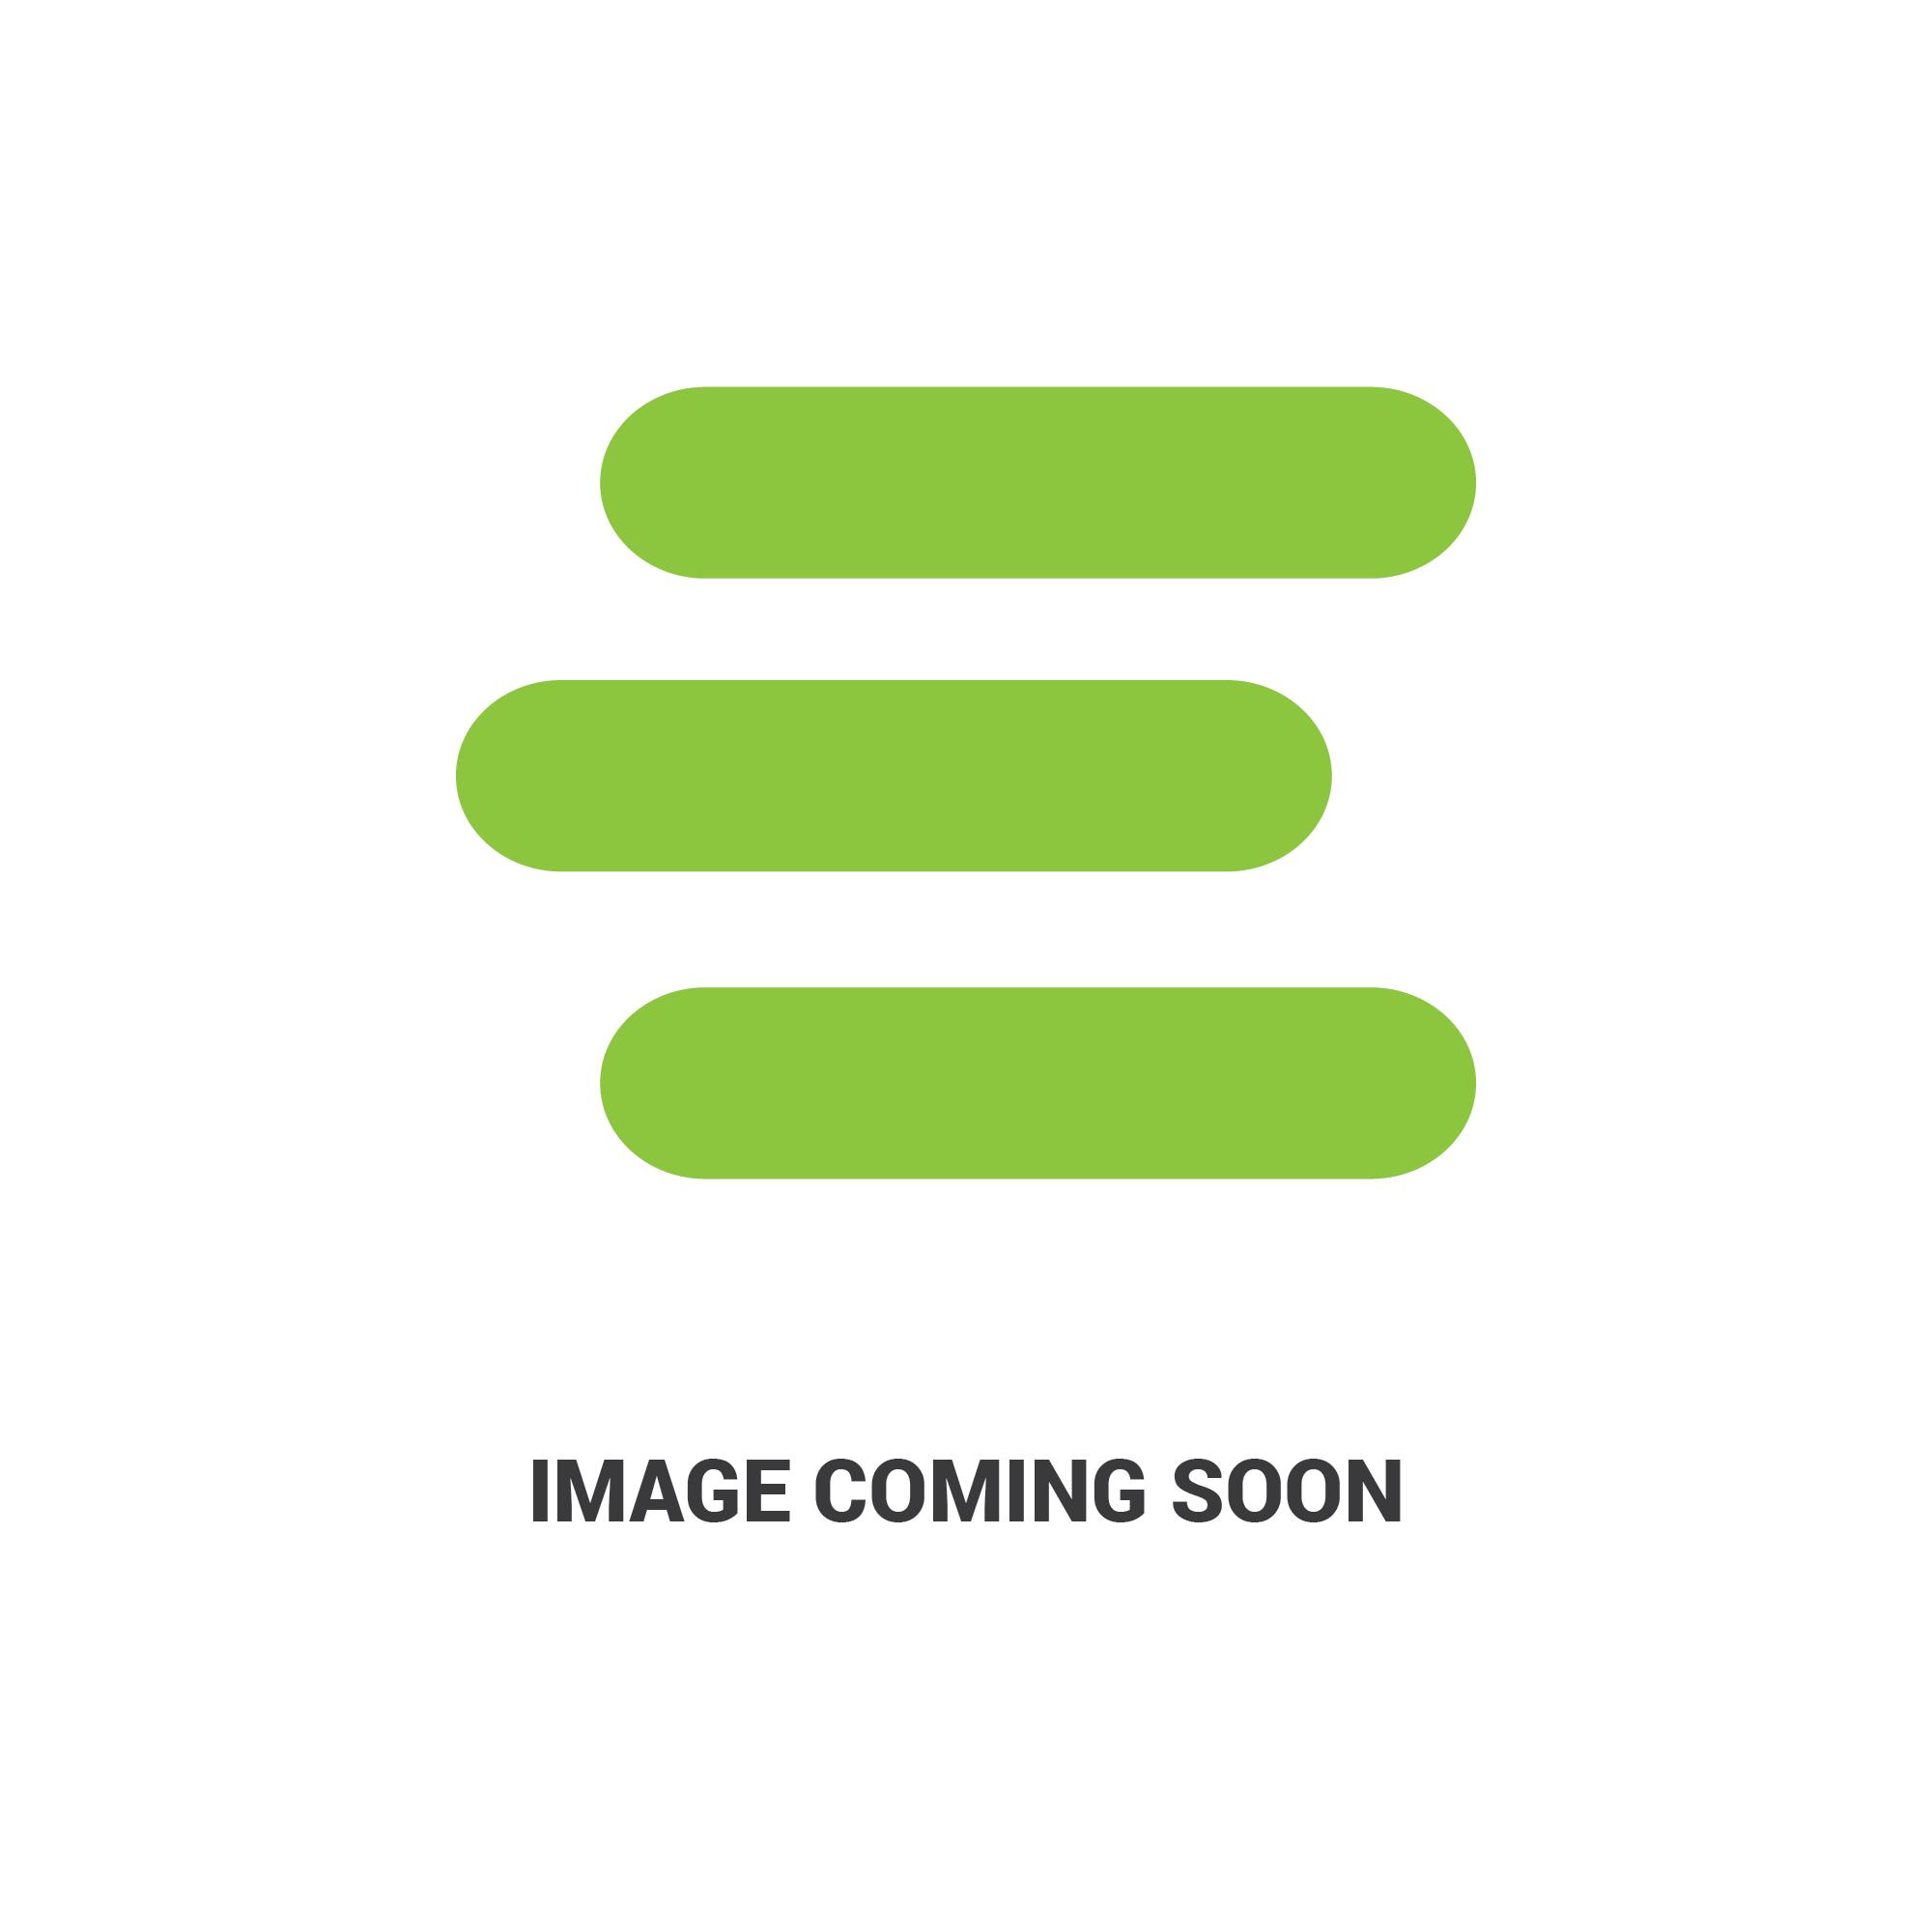 E-16851-60014edit 10.jpg